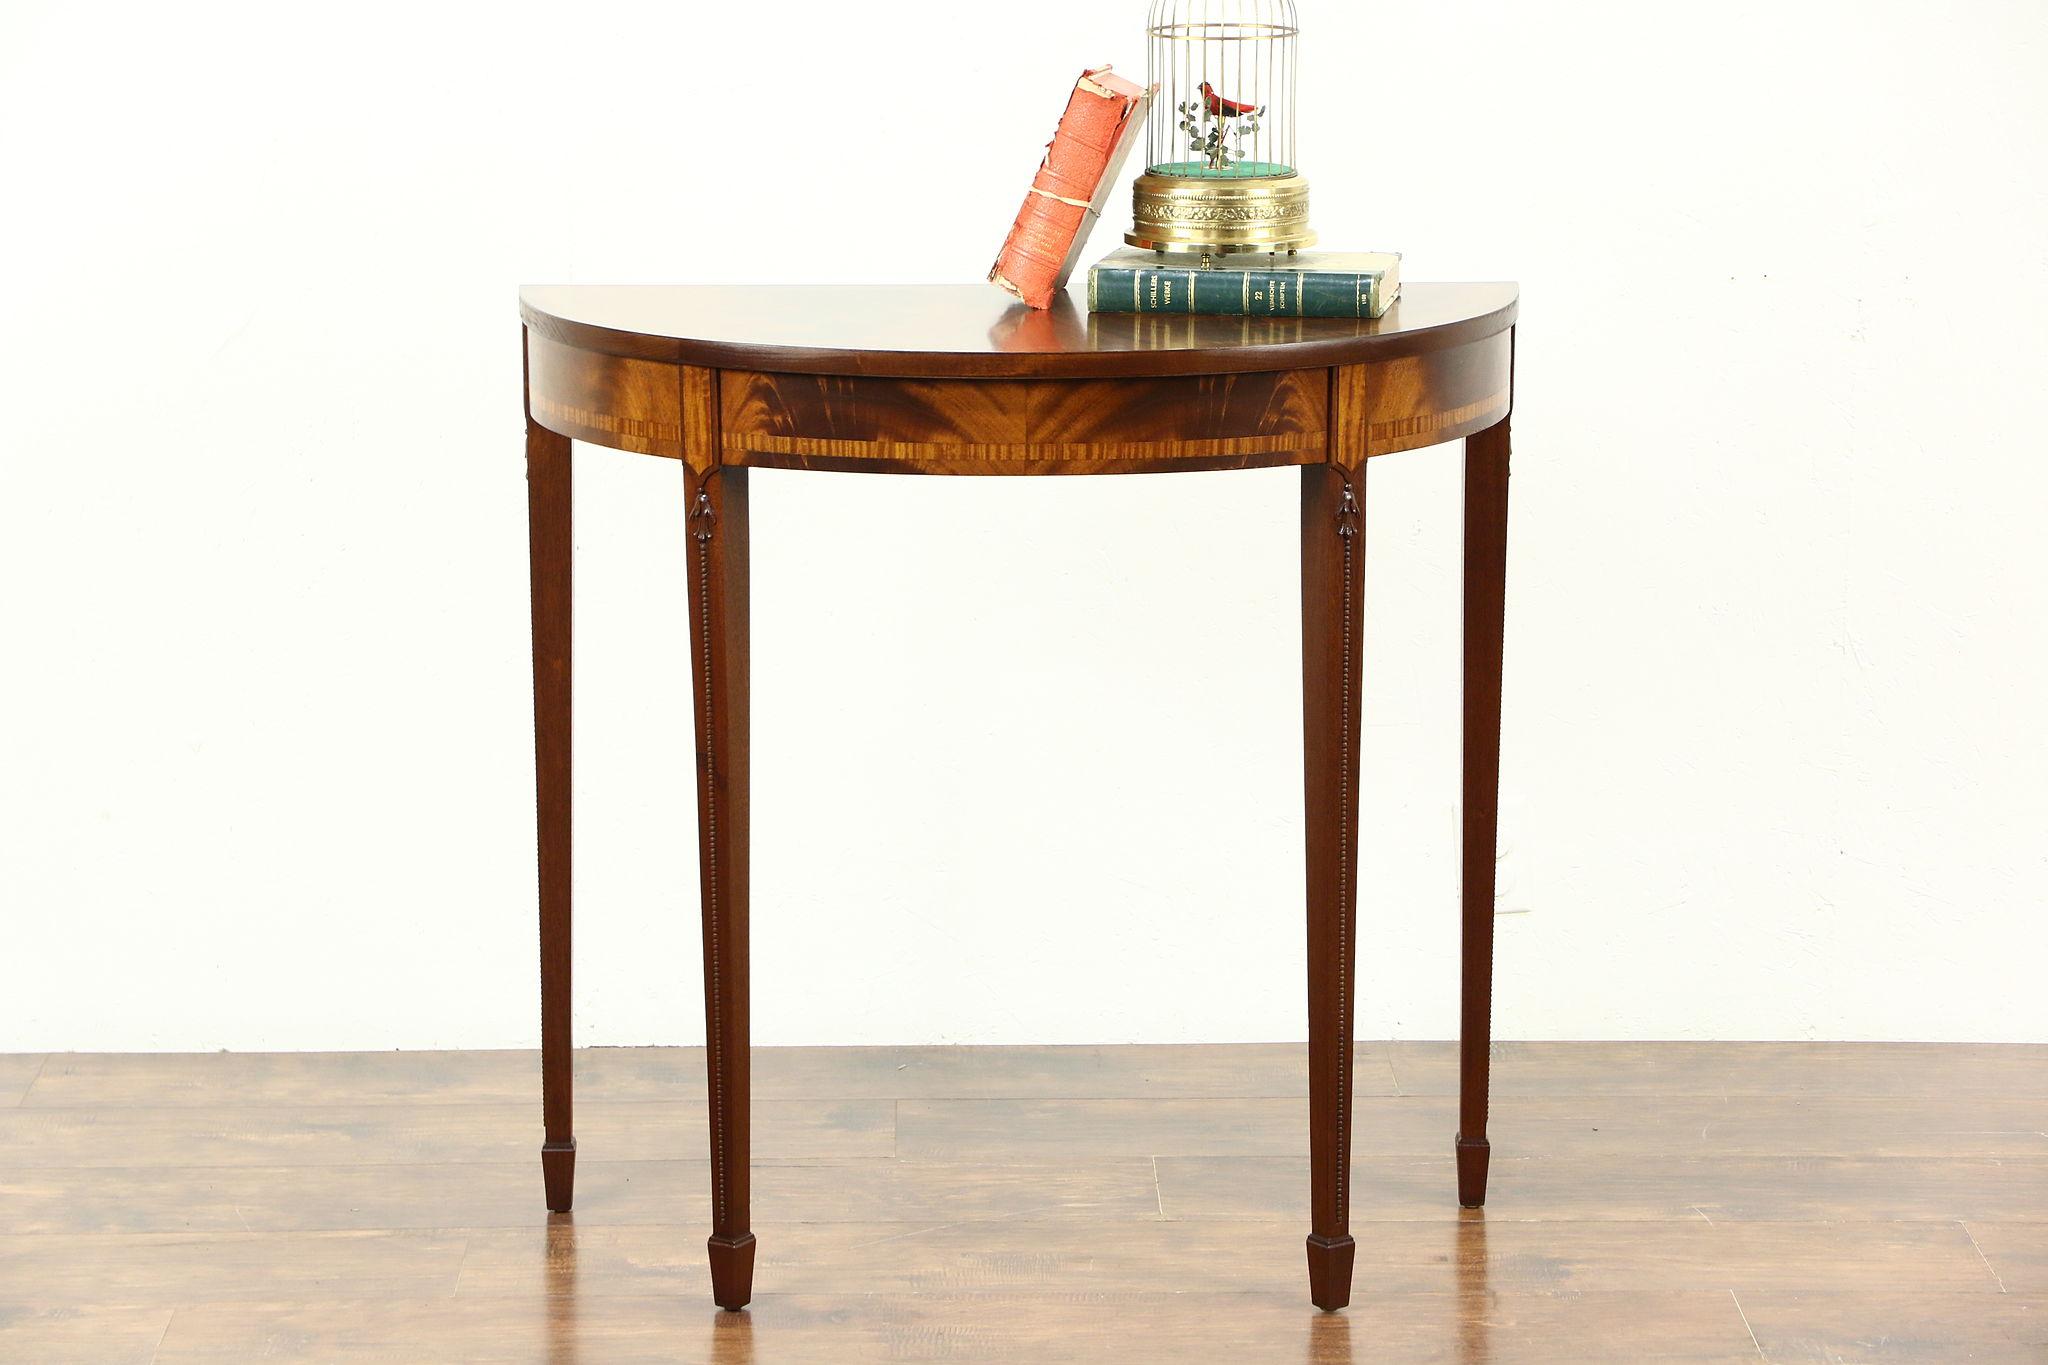 Demilune Half Round Vintage Mahogany Hall Console Table, Inlaid Banding